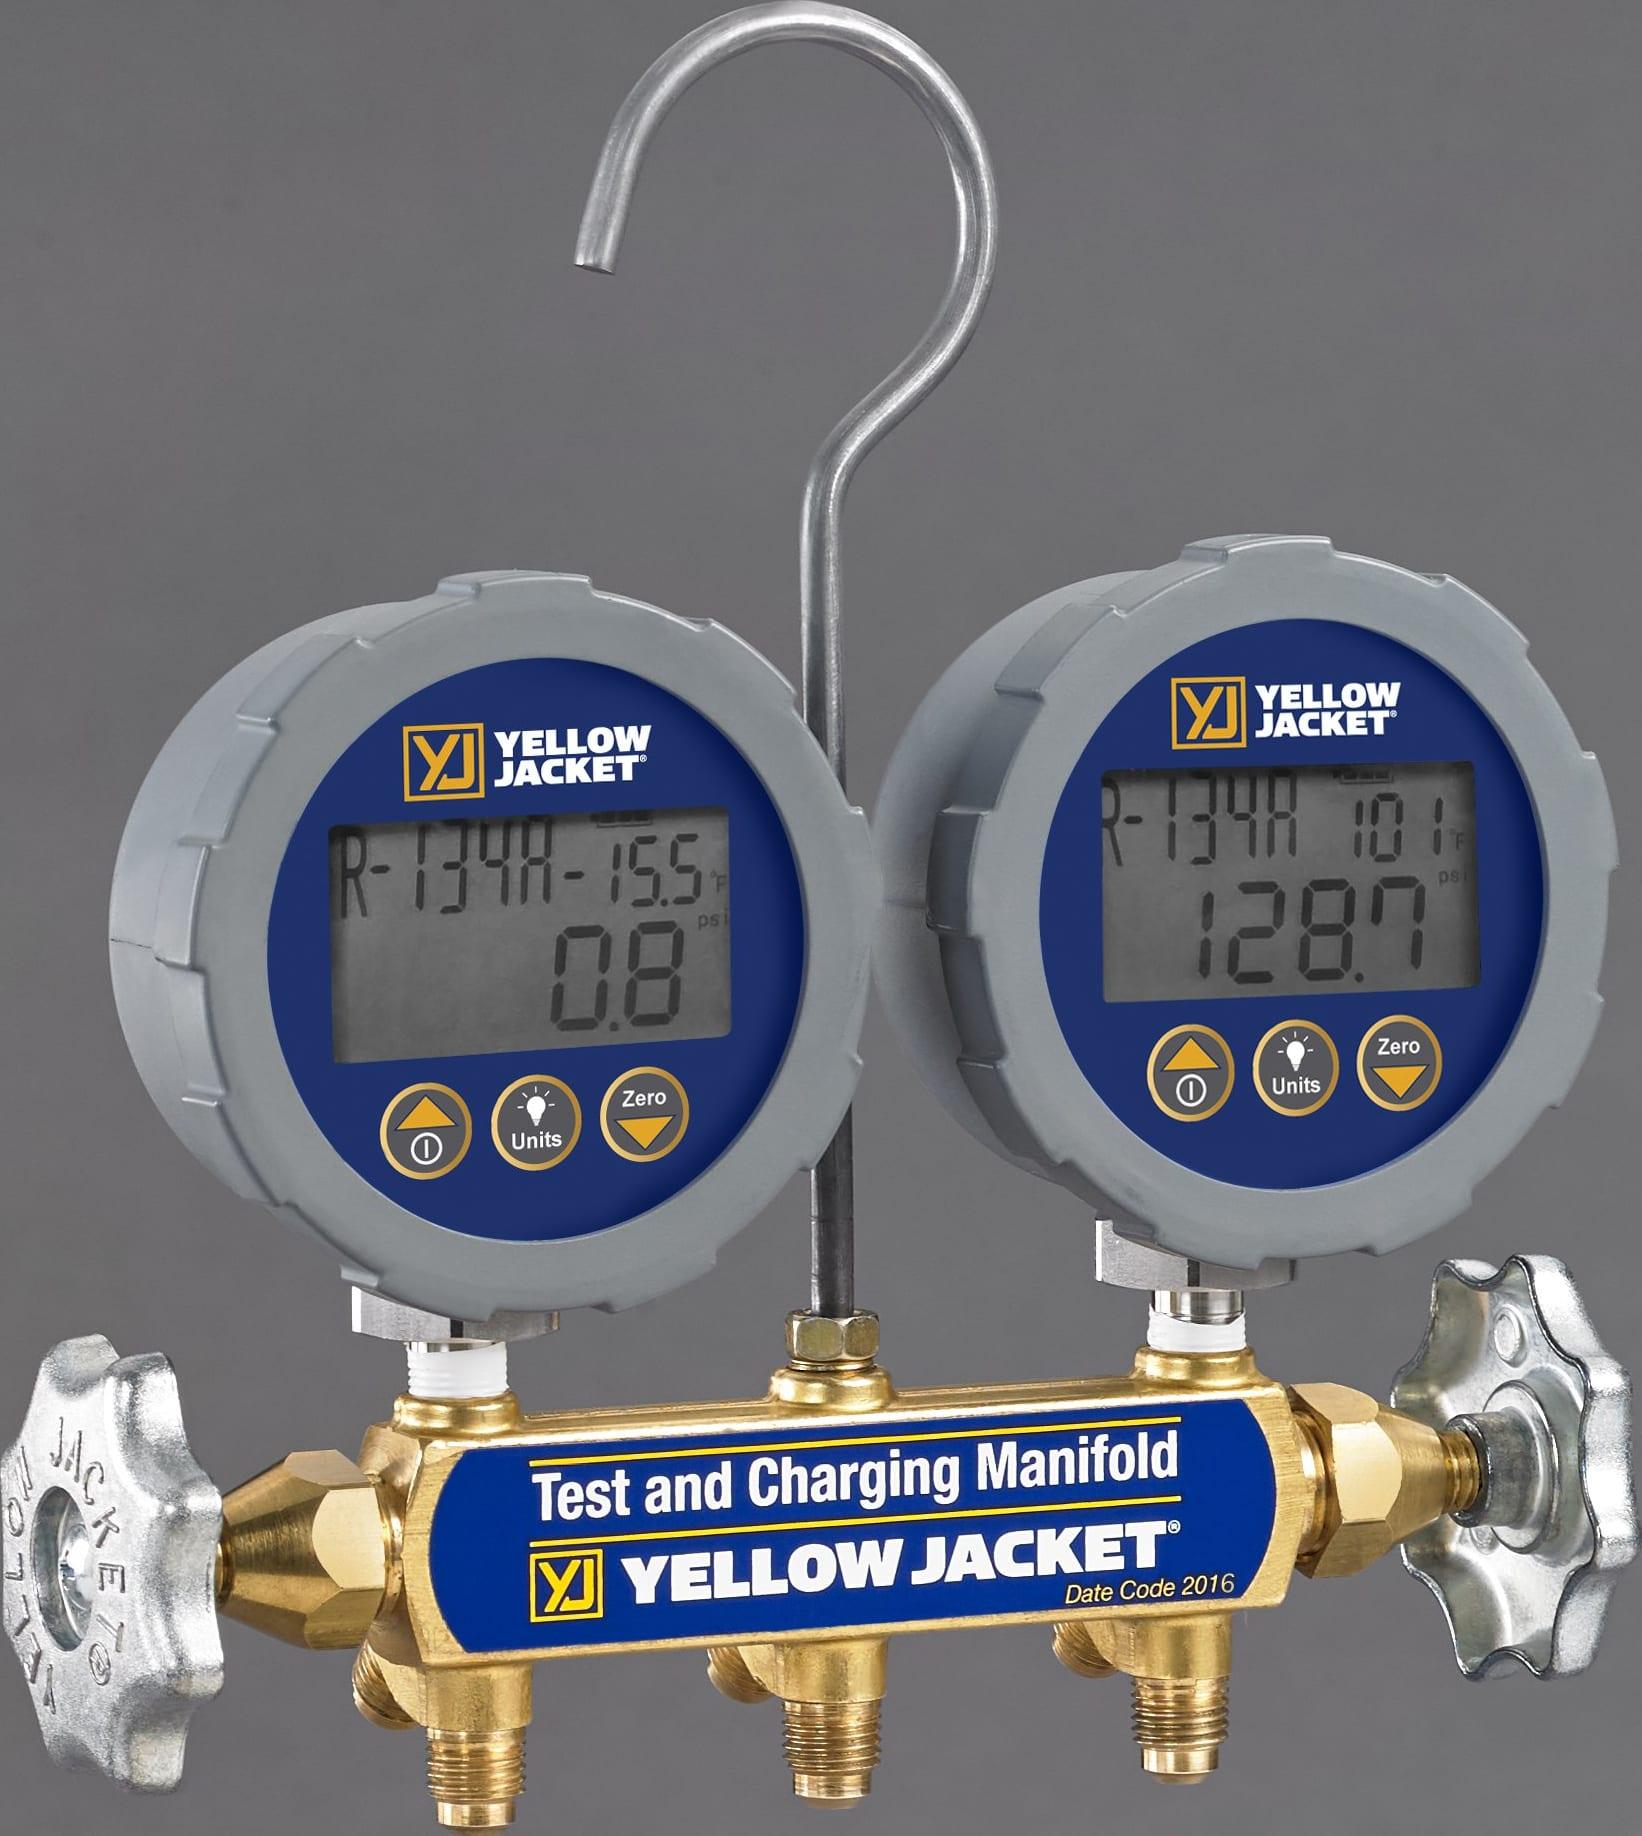 YELLOW JACKET SERIES 41 DIGITAL MANIFOLD 46060